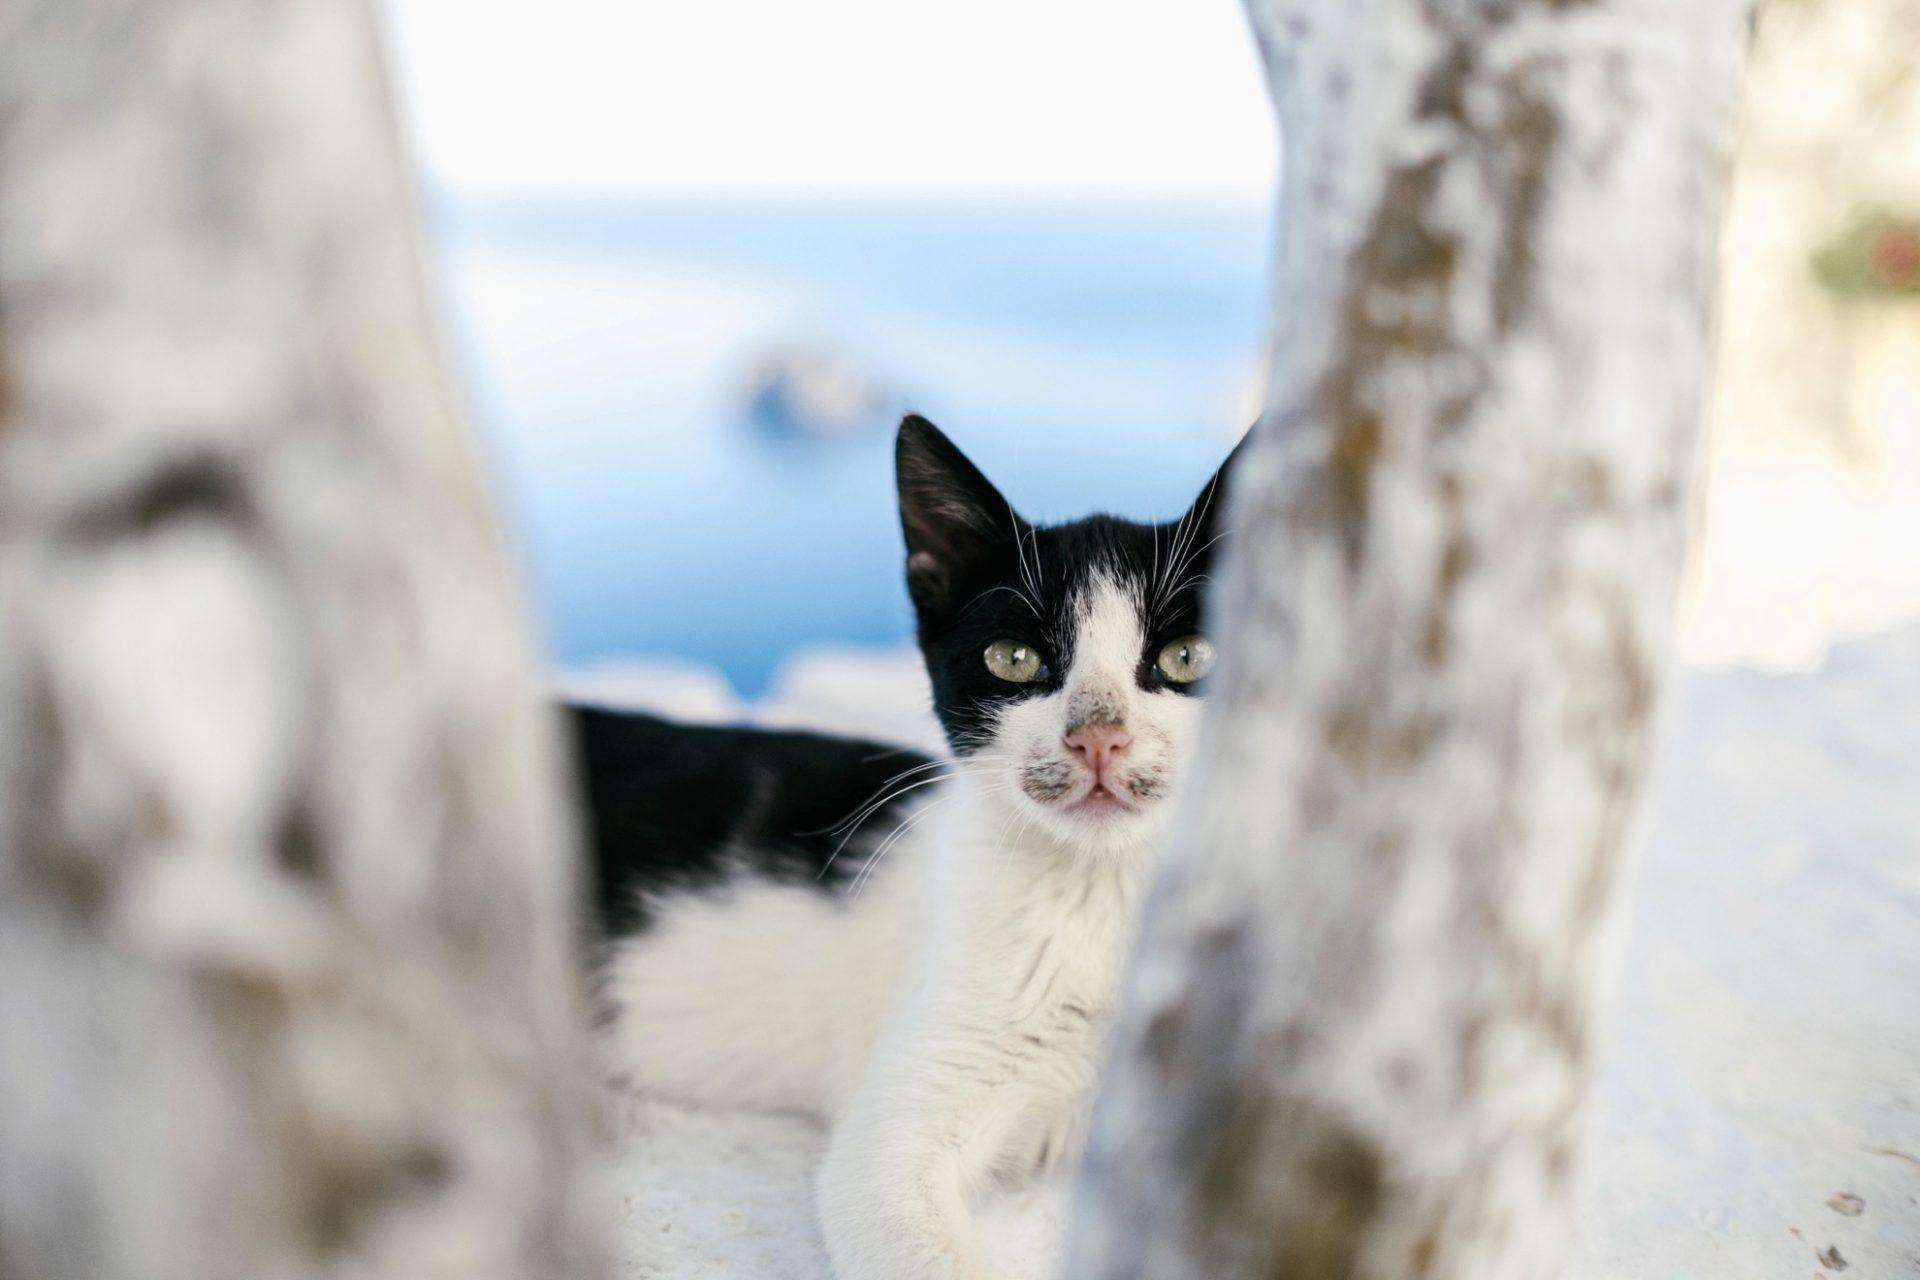 chats grecs@laurentparienti - 13